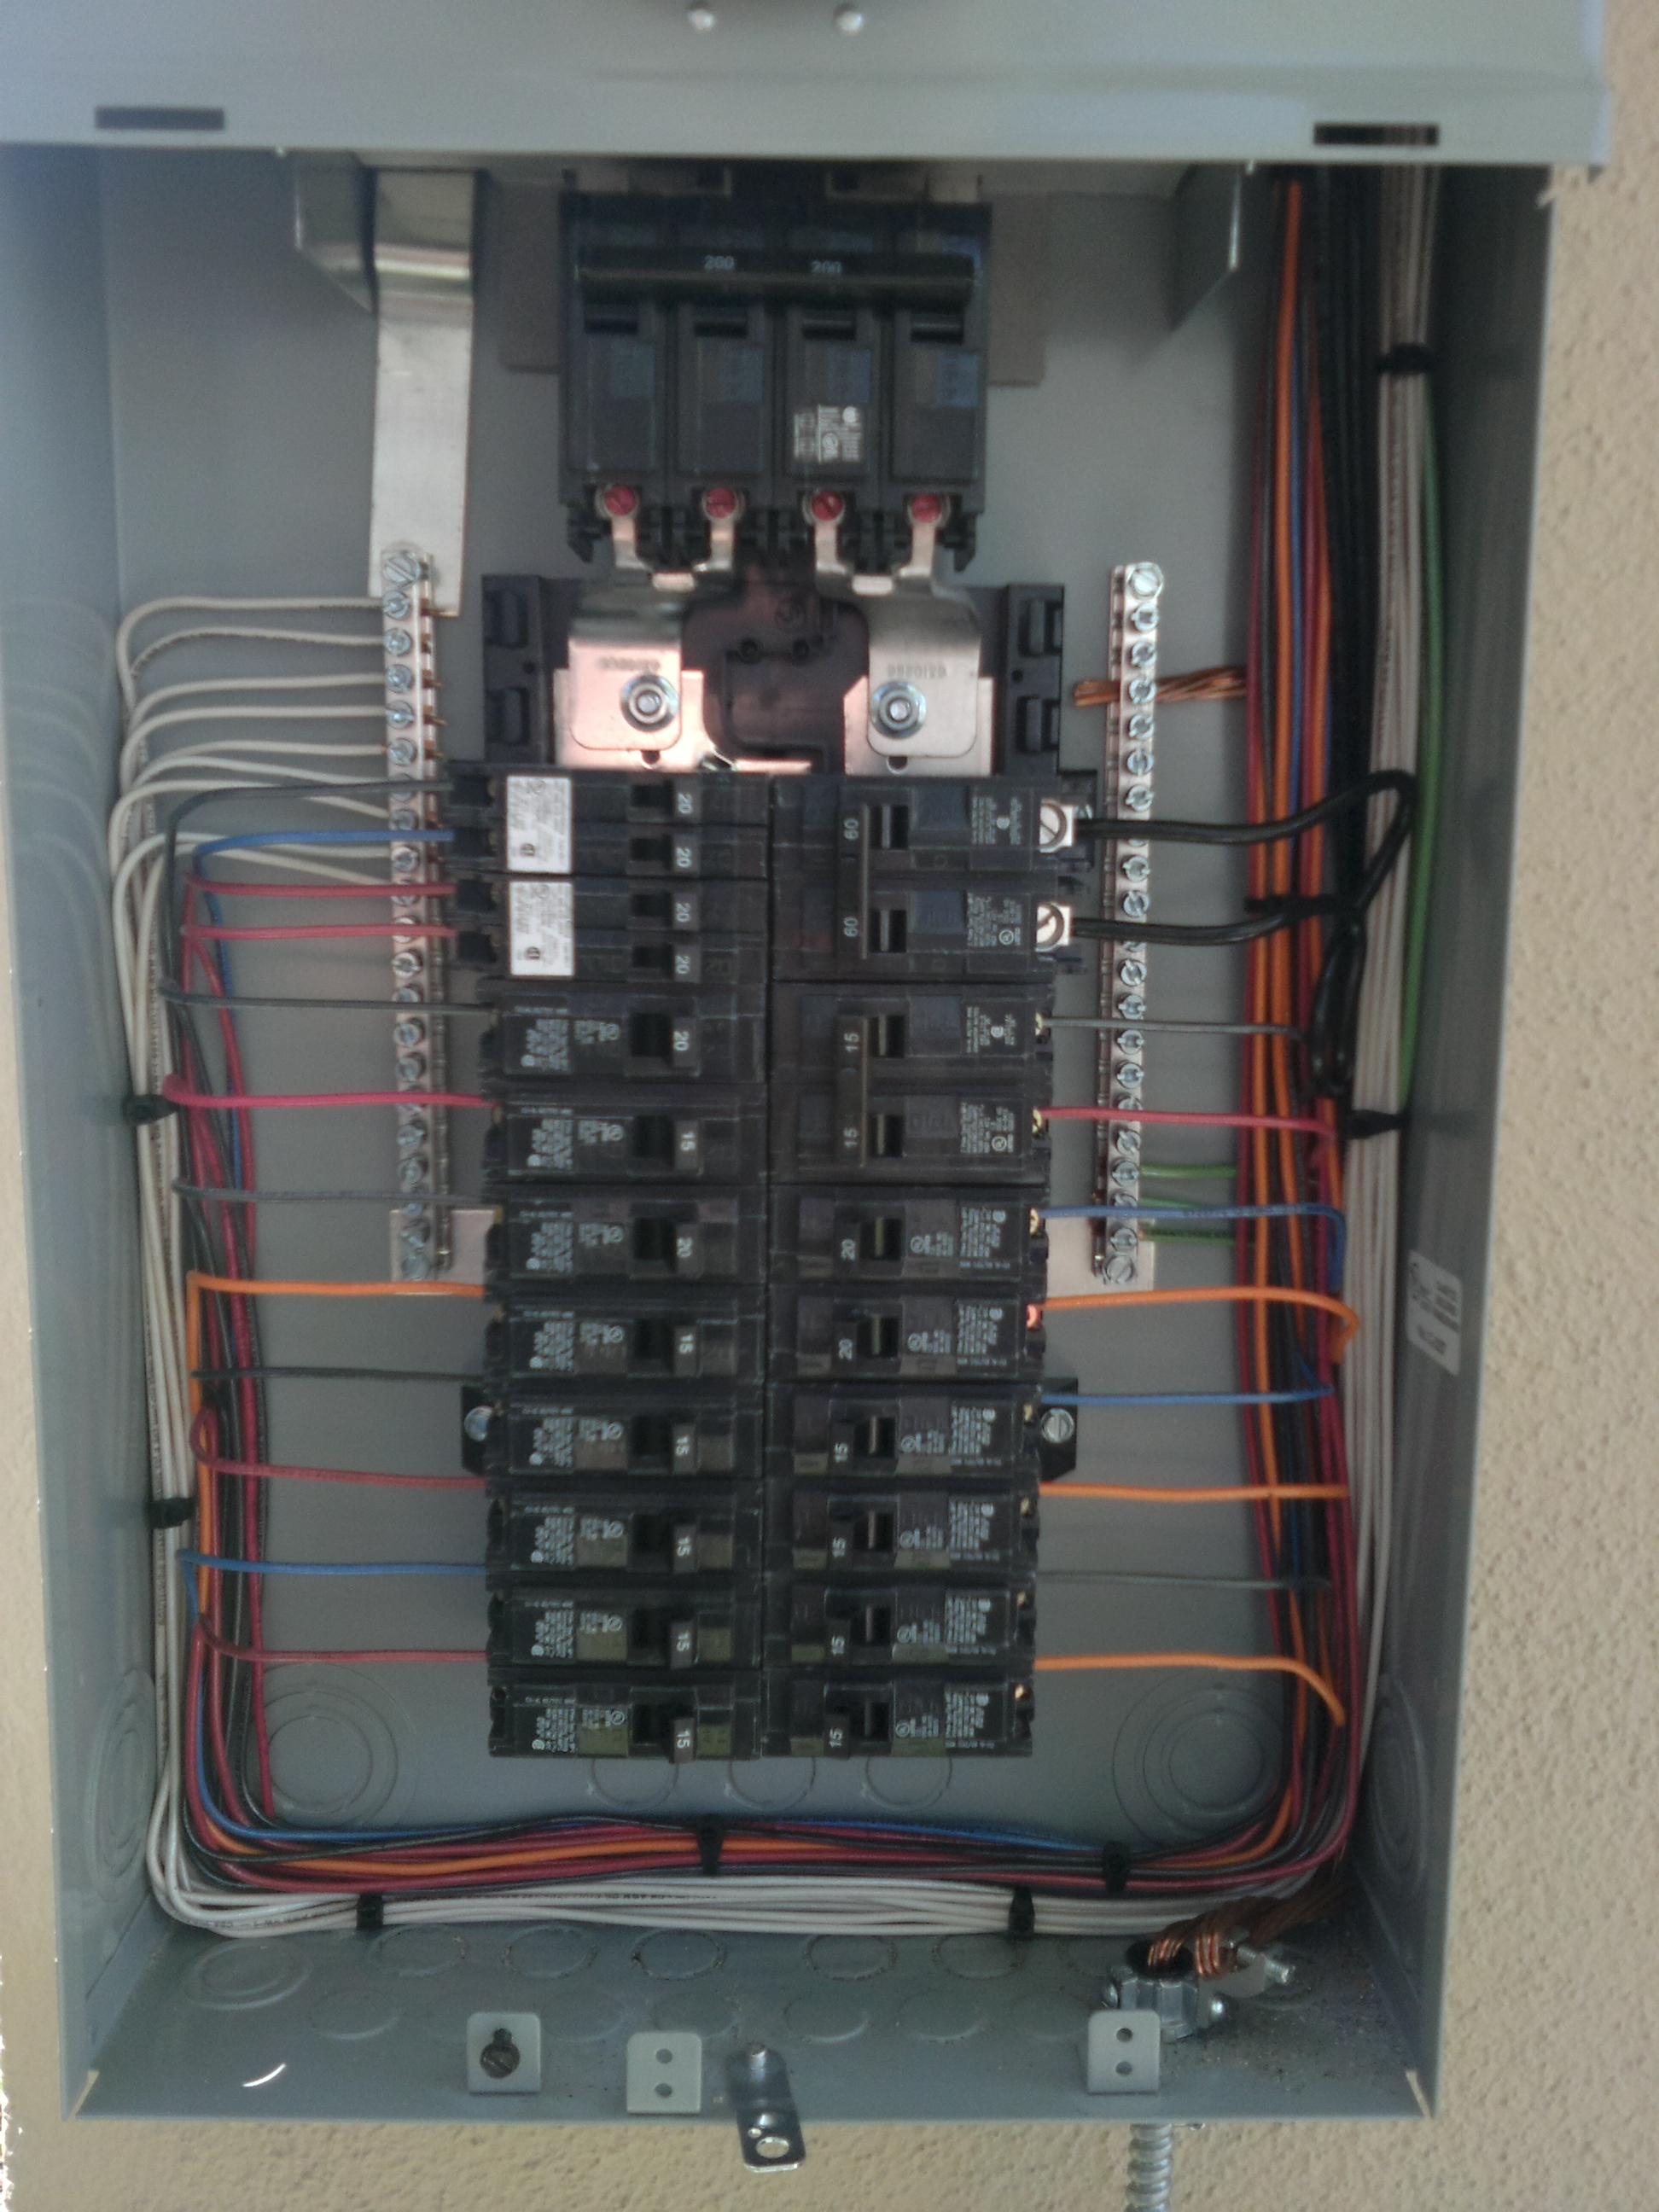 Electrical Breaker Box Wiring Diagram | Wiring Diagram - Electrical Panel Wiring Diagram